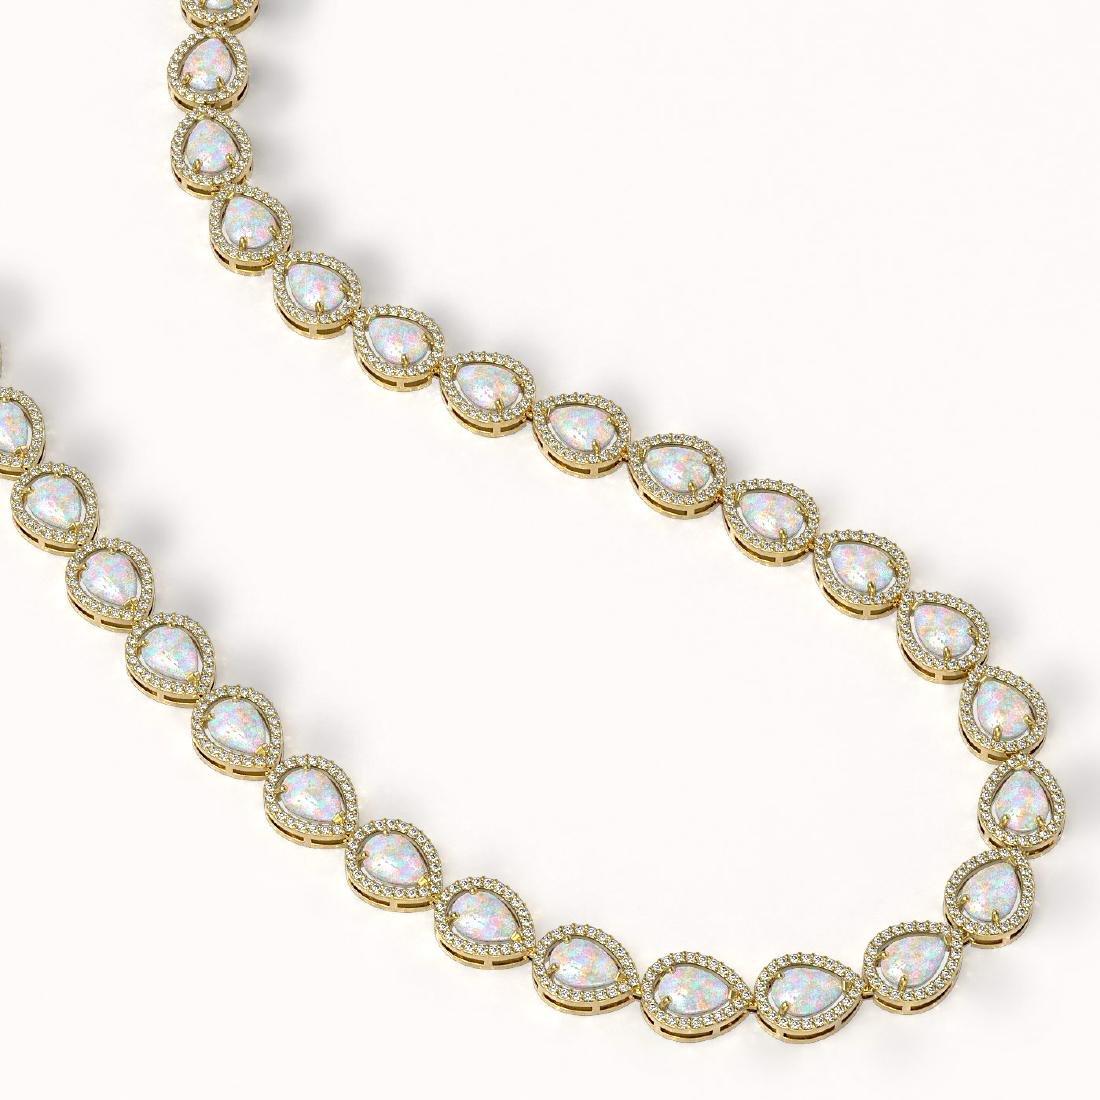 27.93 CTW Opal & Diamond Halo Necklace 10K Yellow Gold - 2